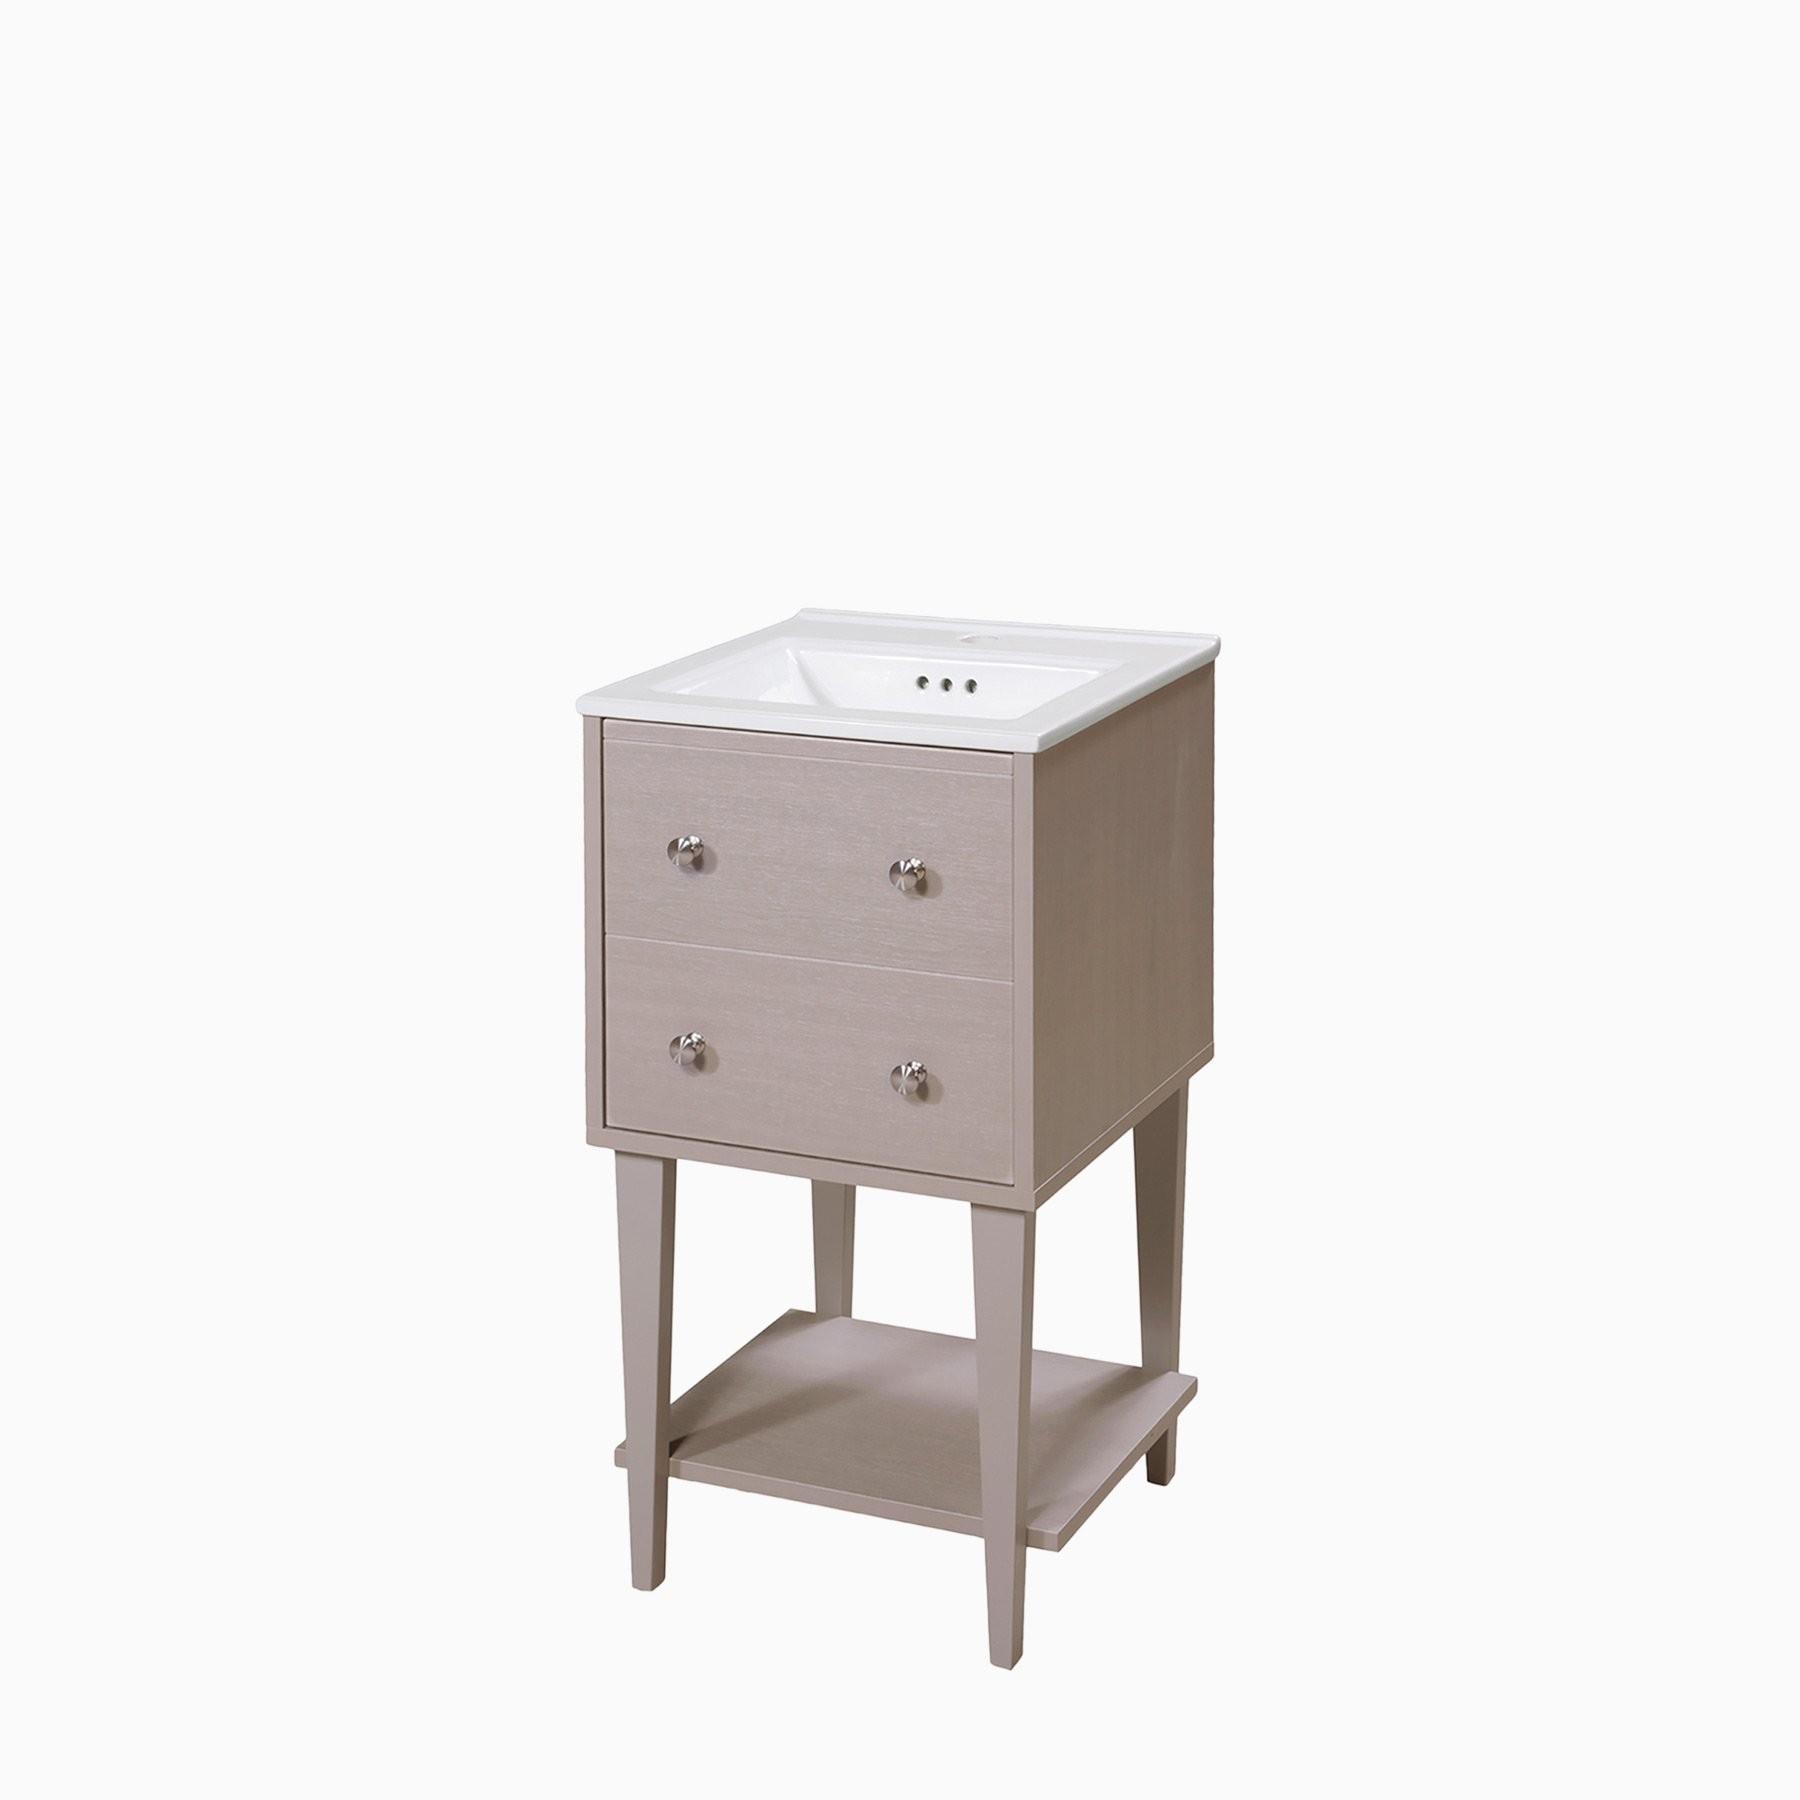 Sink Freestanding Bathroom Vanity Set